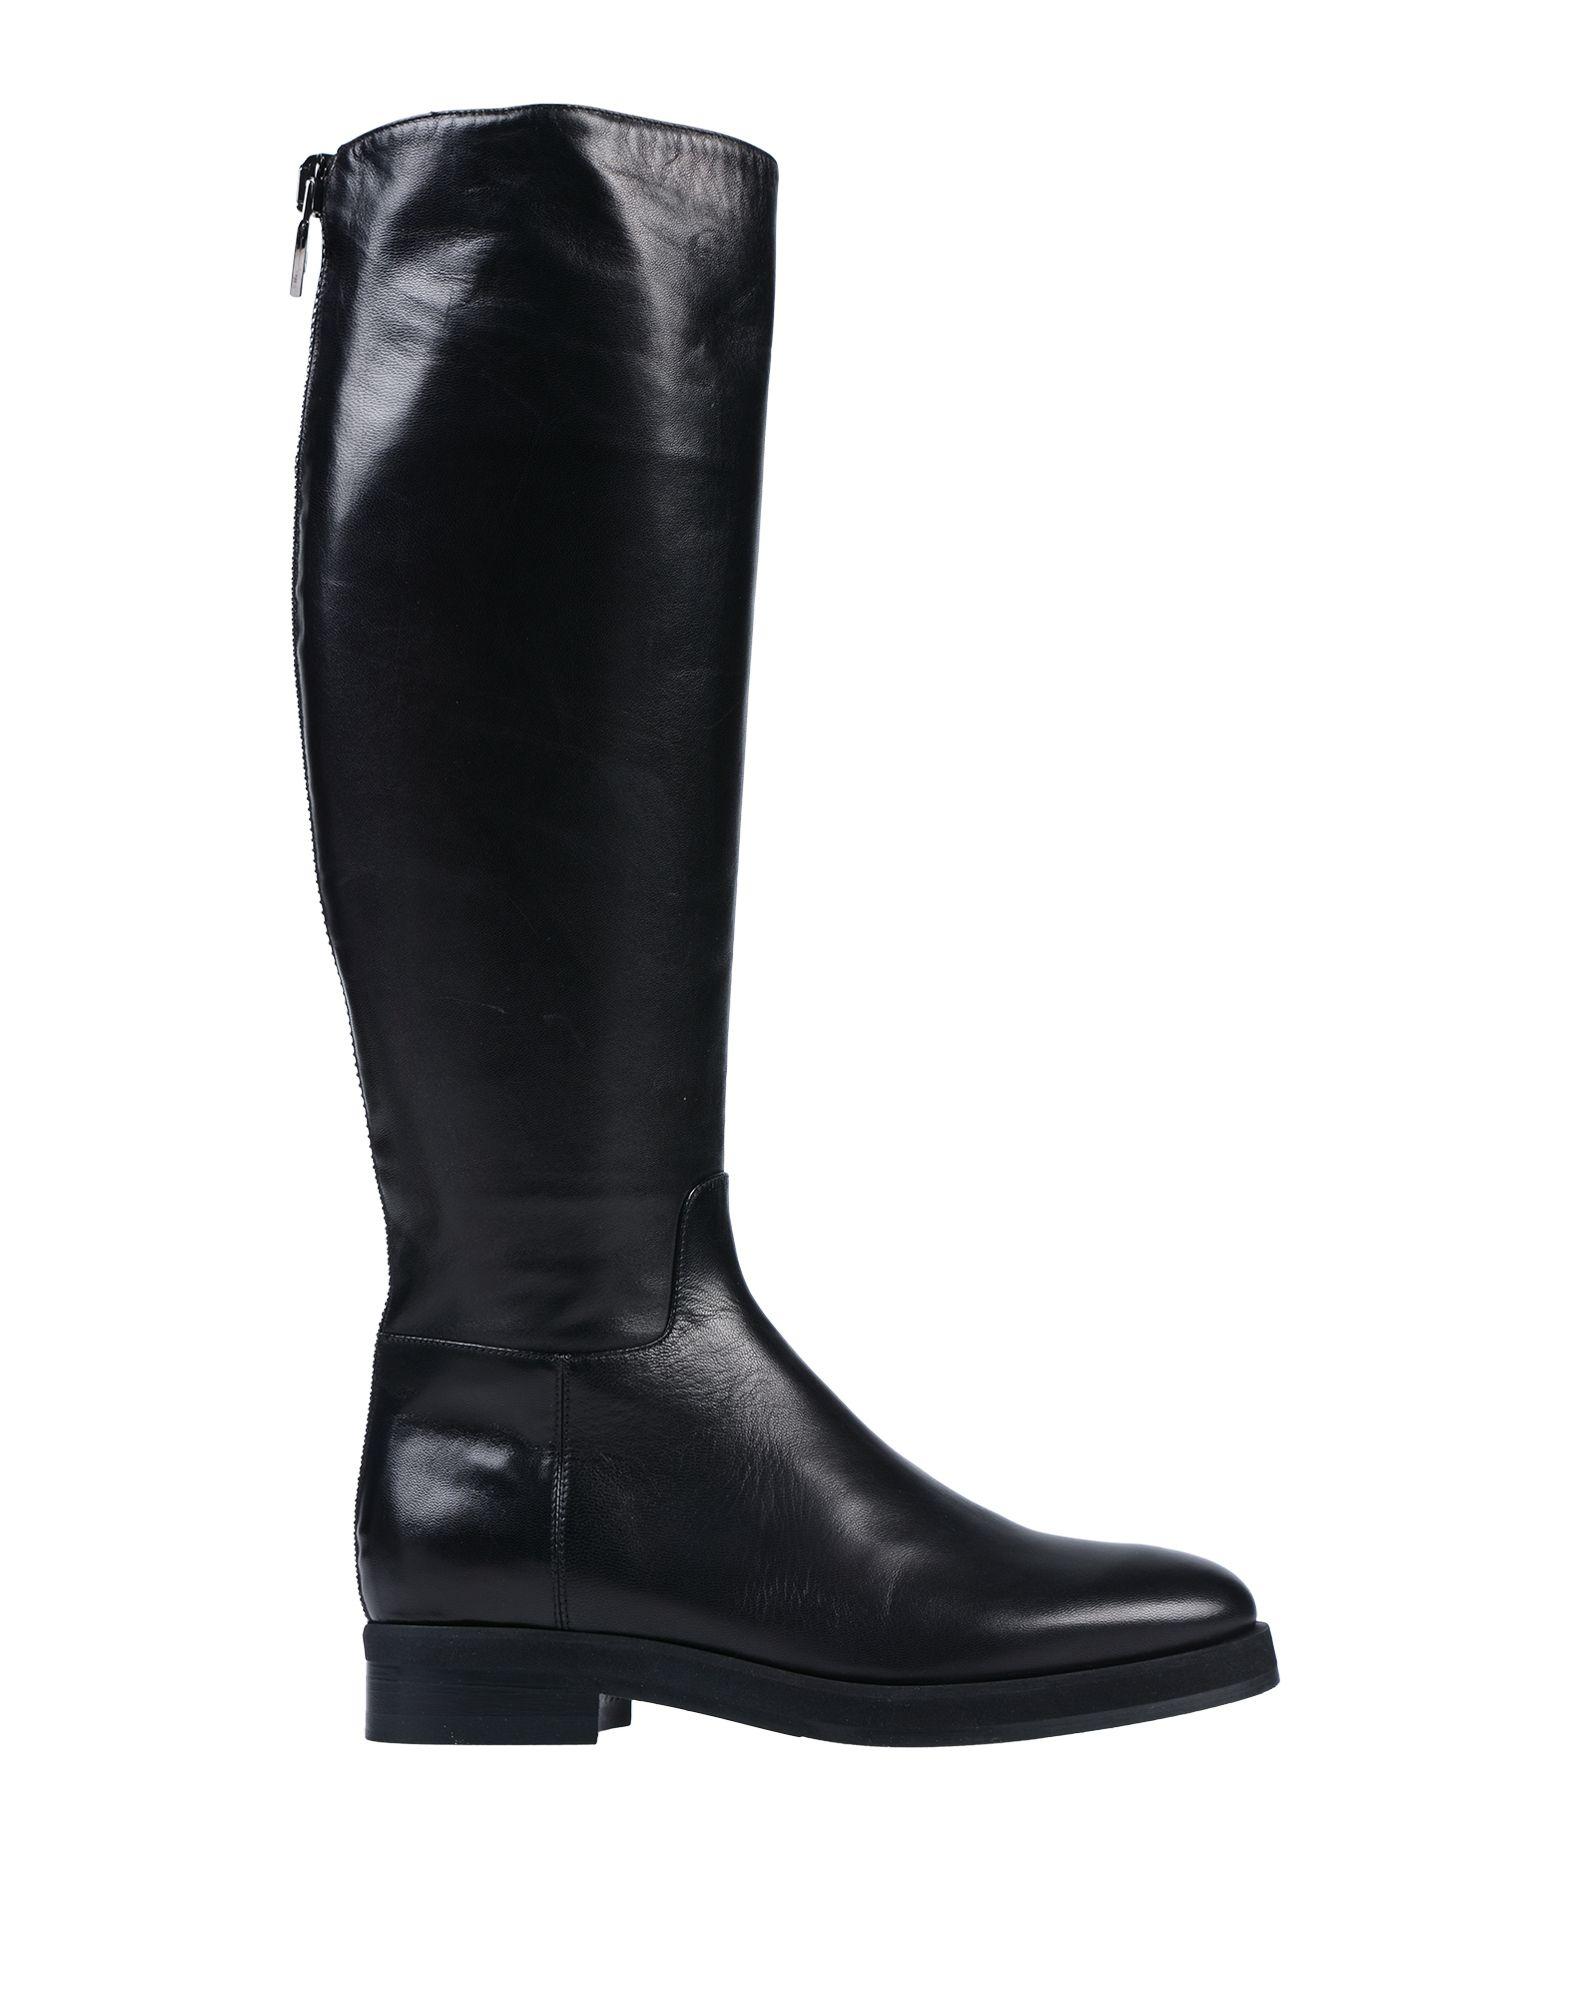 Loriblu Boots - Women Loriblu Australia Boots online on  Australia Loriblu - 11560494VU 03d8ed